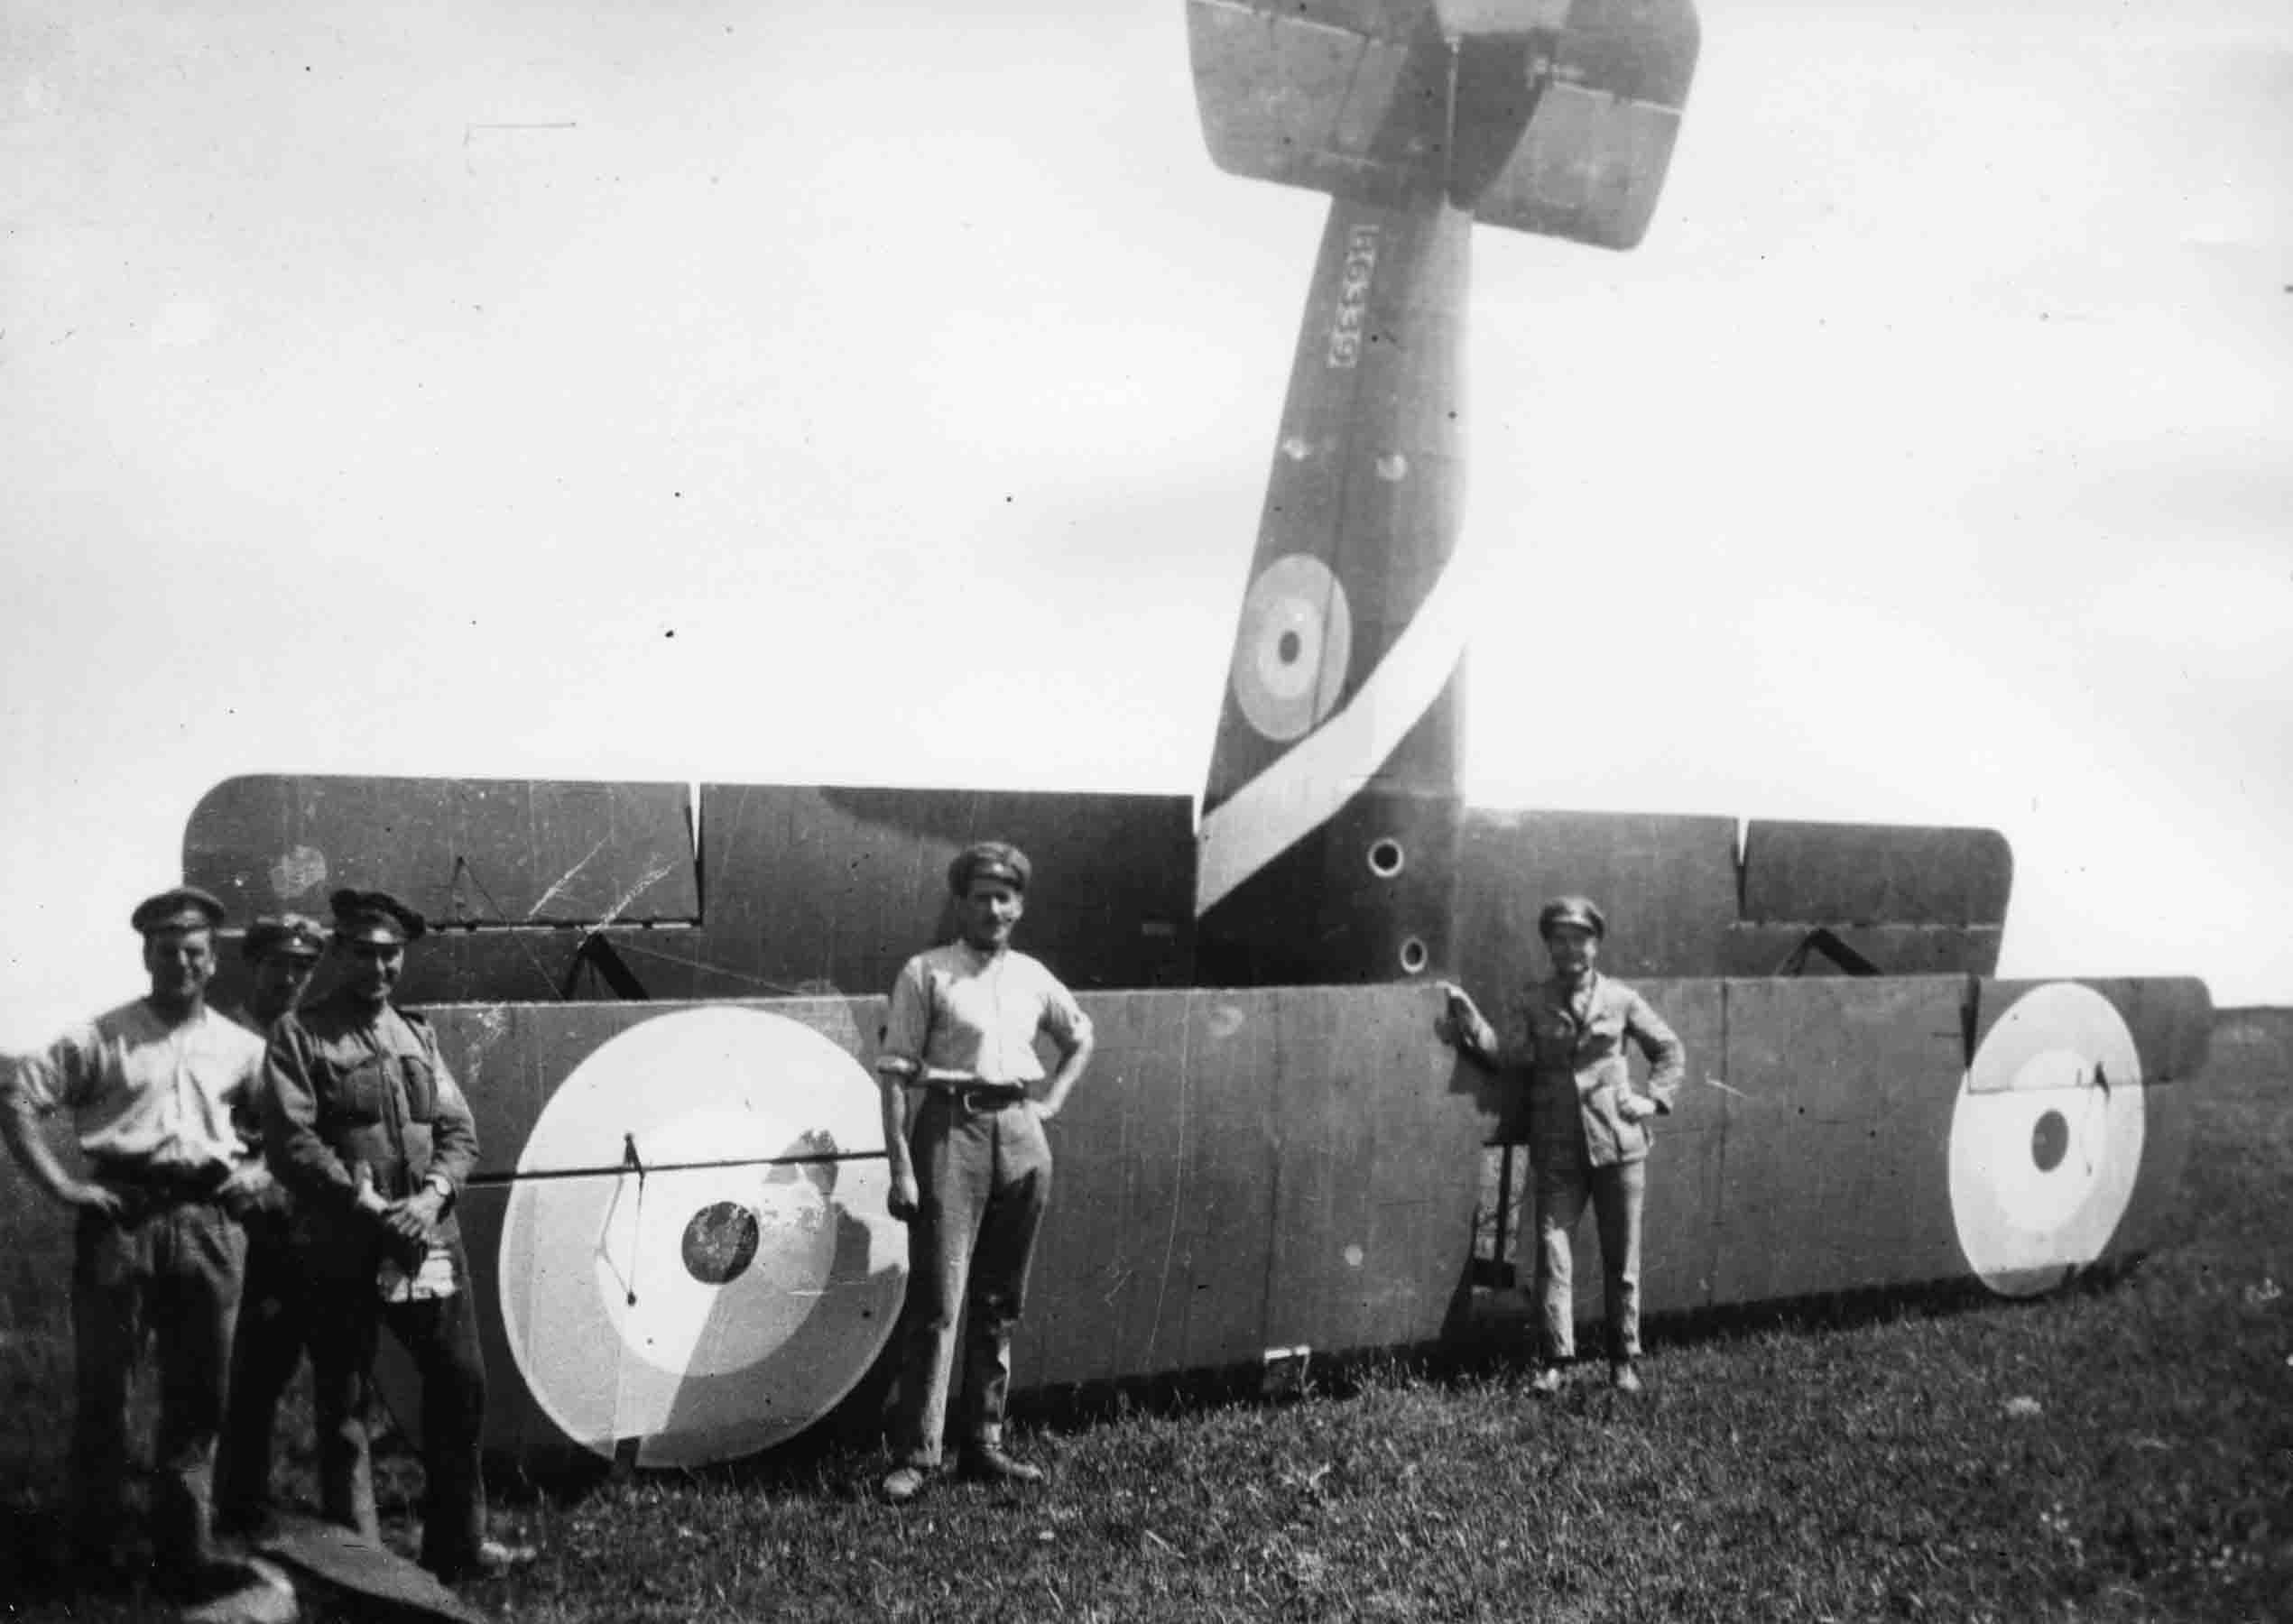 X003-2602/14939: Sopwith F.1 Camel, serial B6339, crashed, probably 225 Squadron, RAF, Italy, 1918.